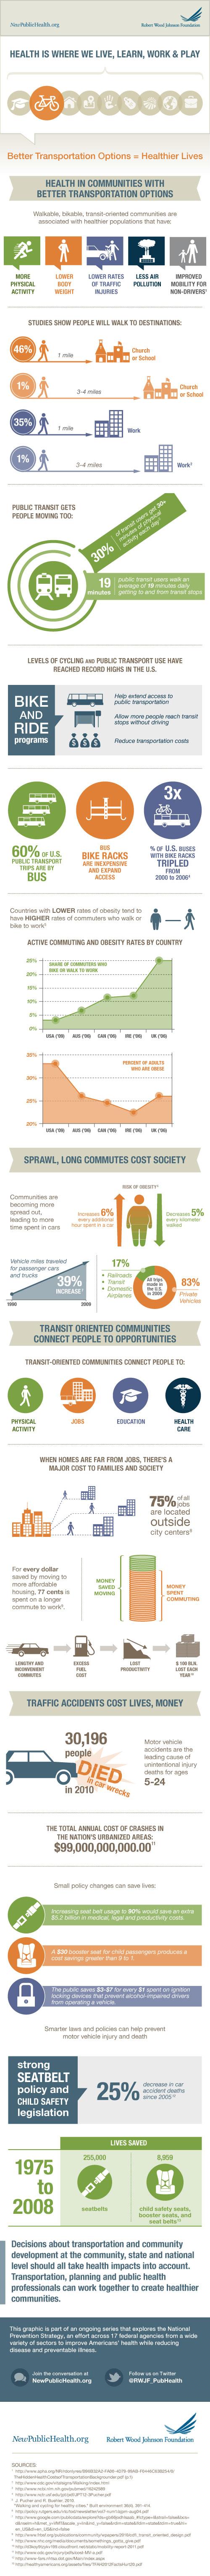 RWJF Public Transportation Health Benefits - infographic